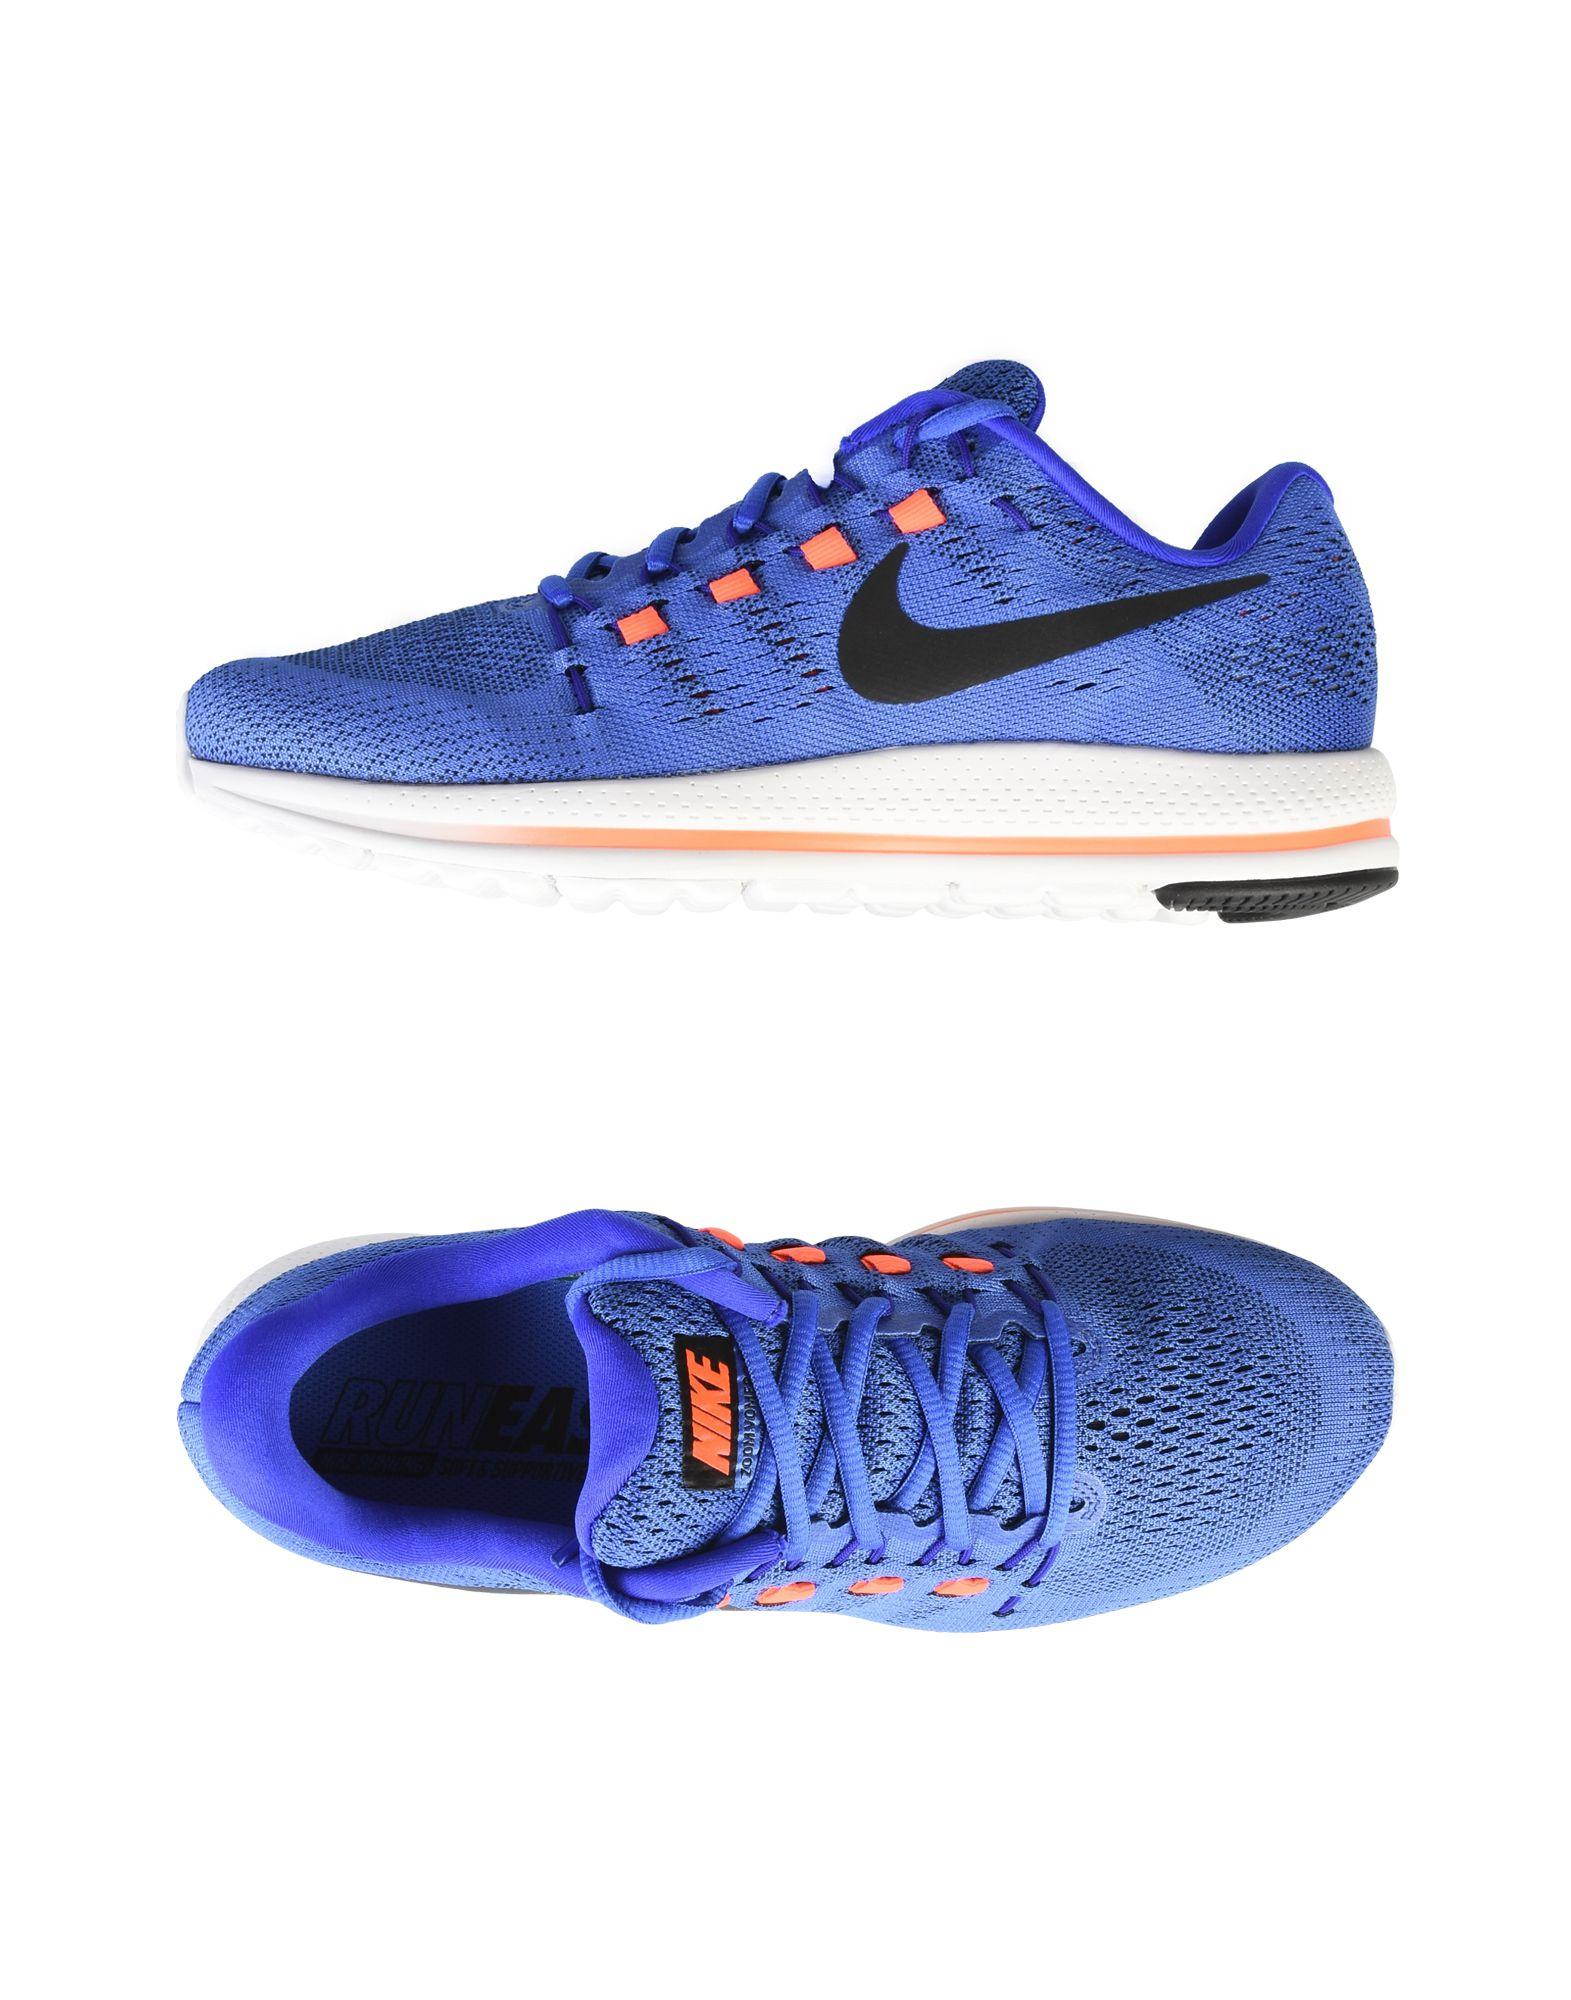 NIKE Herren Low Sneakers & Tennisschuhe Farbe Königsblau Größe 6 jetztbilligerkaufen